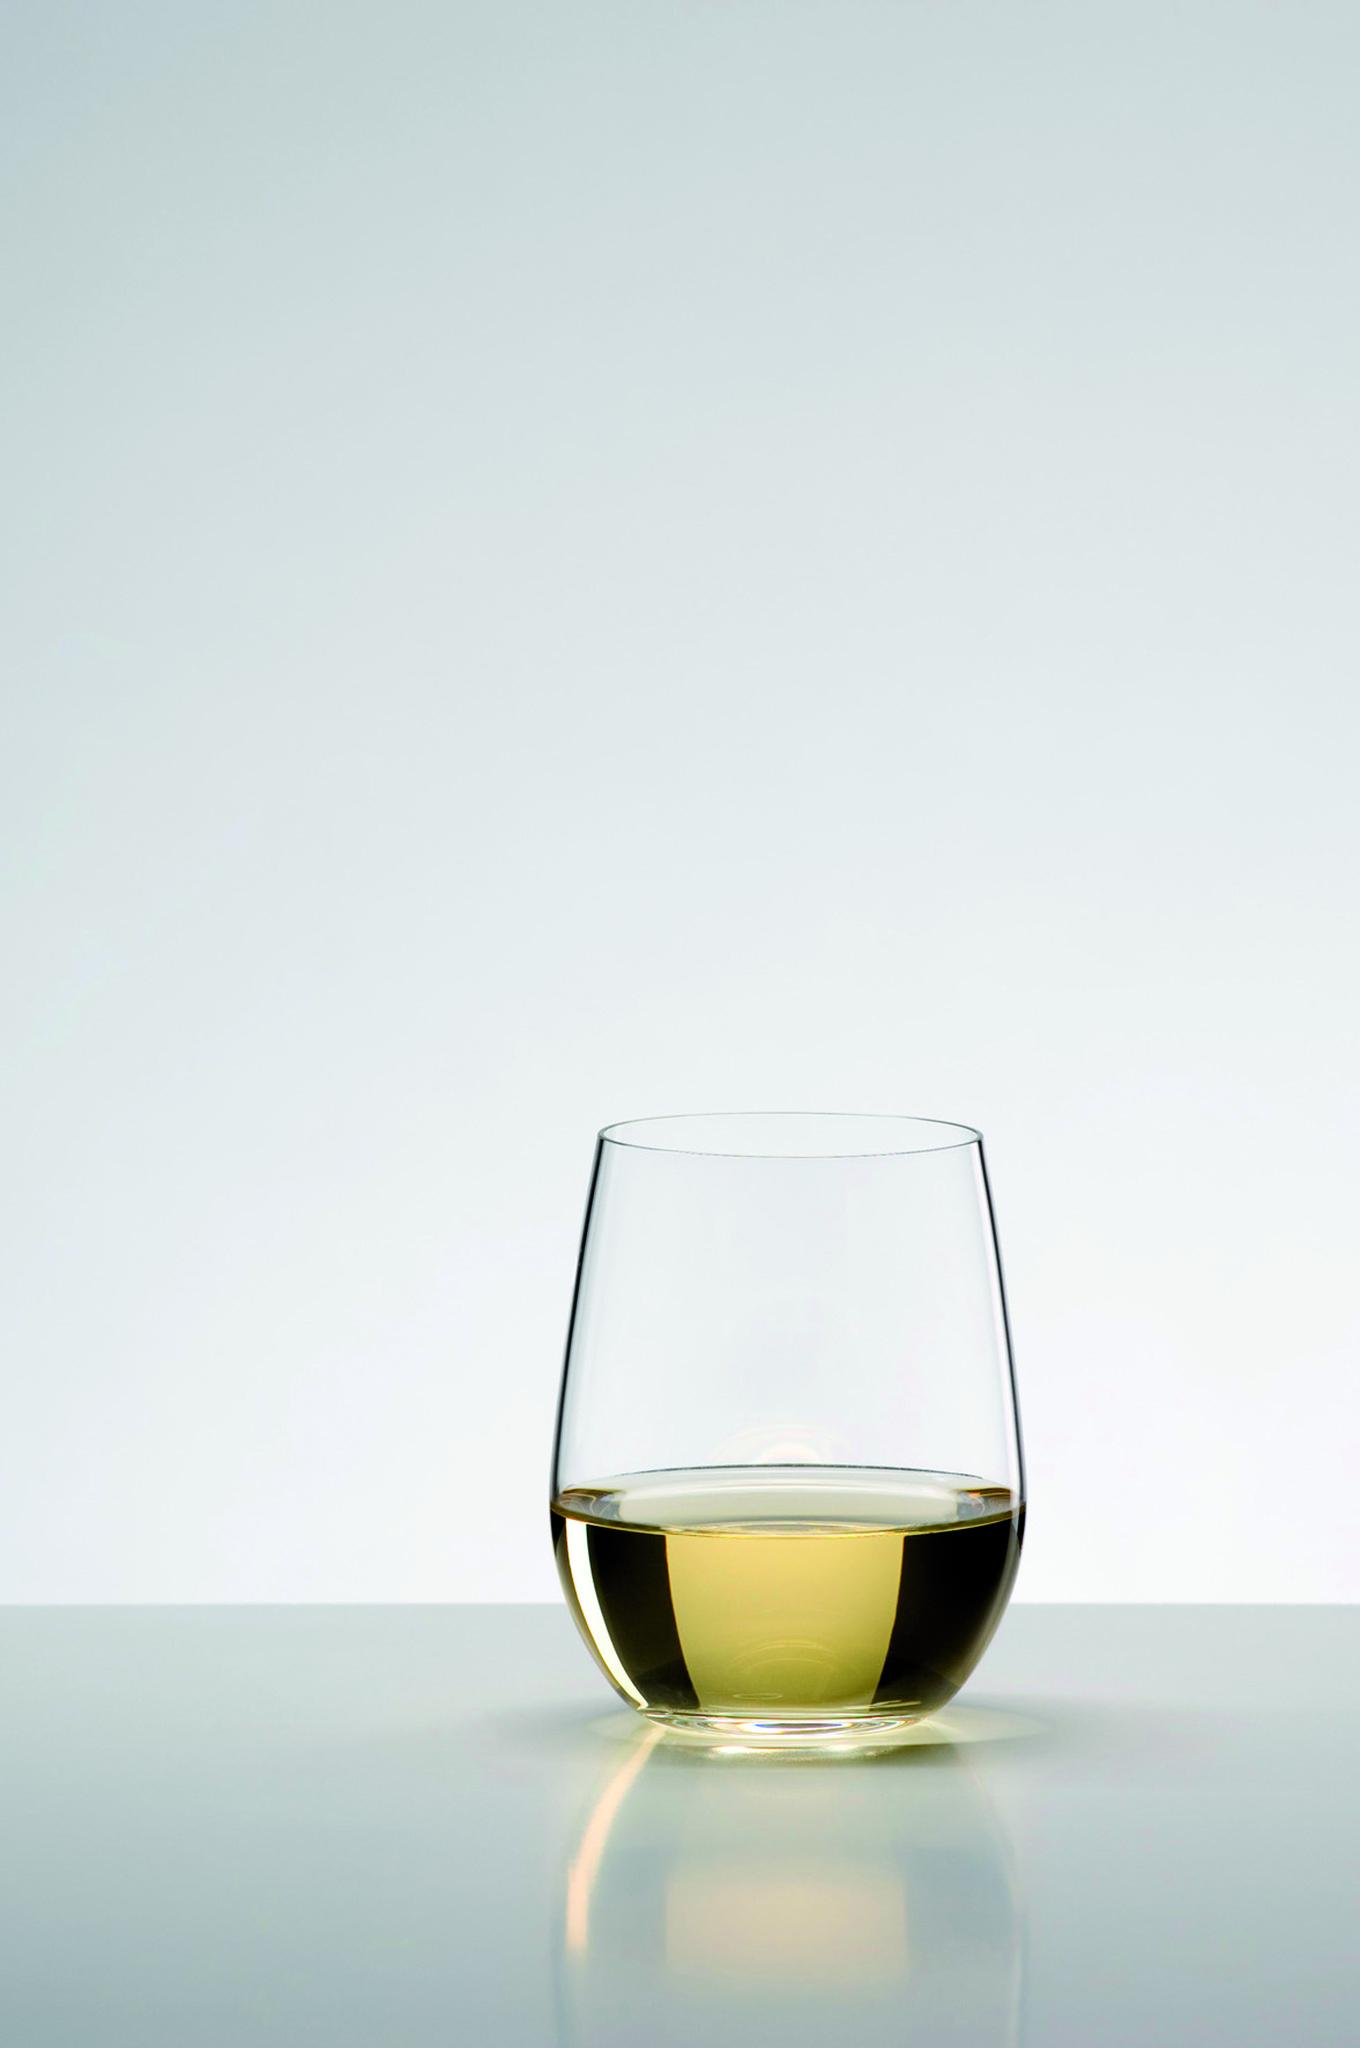 Бокалы Набор бокалов для белого вина 2шт 320мл Riedel The O Wine Tumbler Chardonnay/Viognier nabor-bokalov-dlya-belogo-vina-2-sht-320-ml-riedel-the-o-wine-tumbler-chardonnayviognier-avstriy.jpg